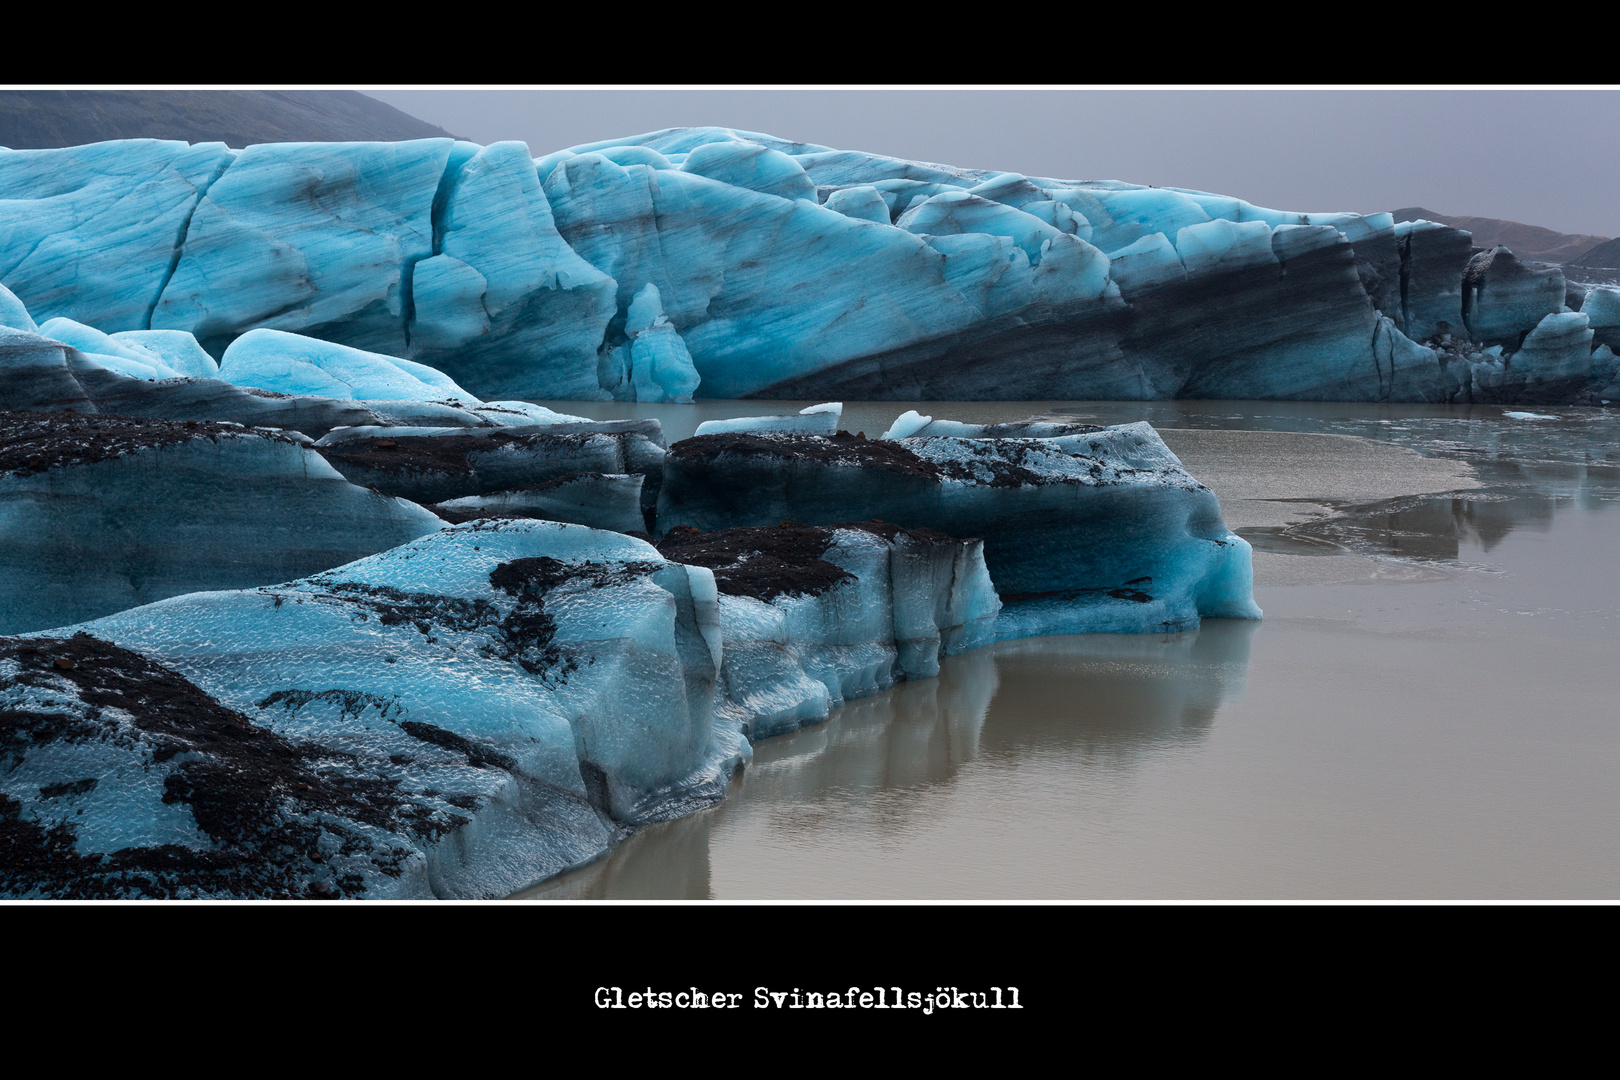 Gletscher Svinafellsjökull